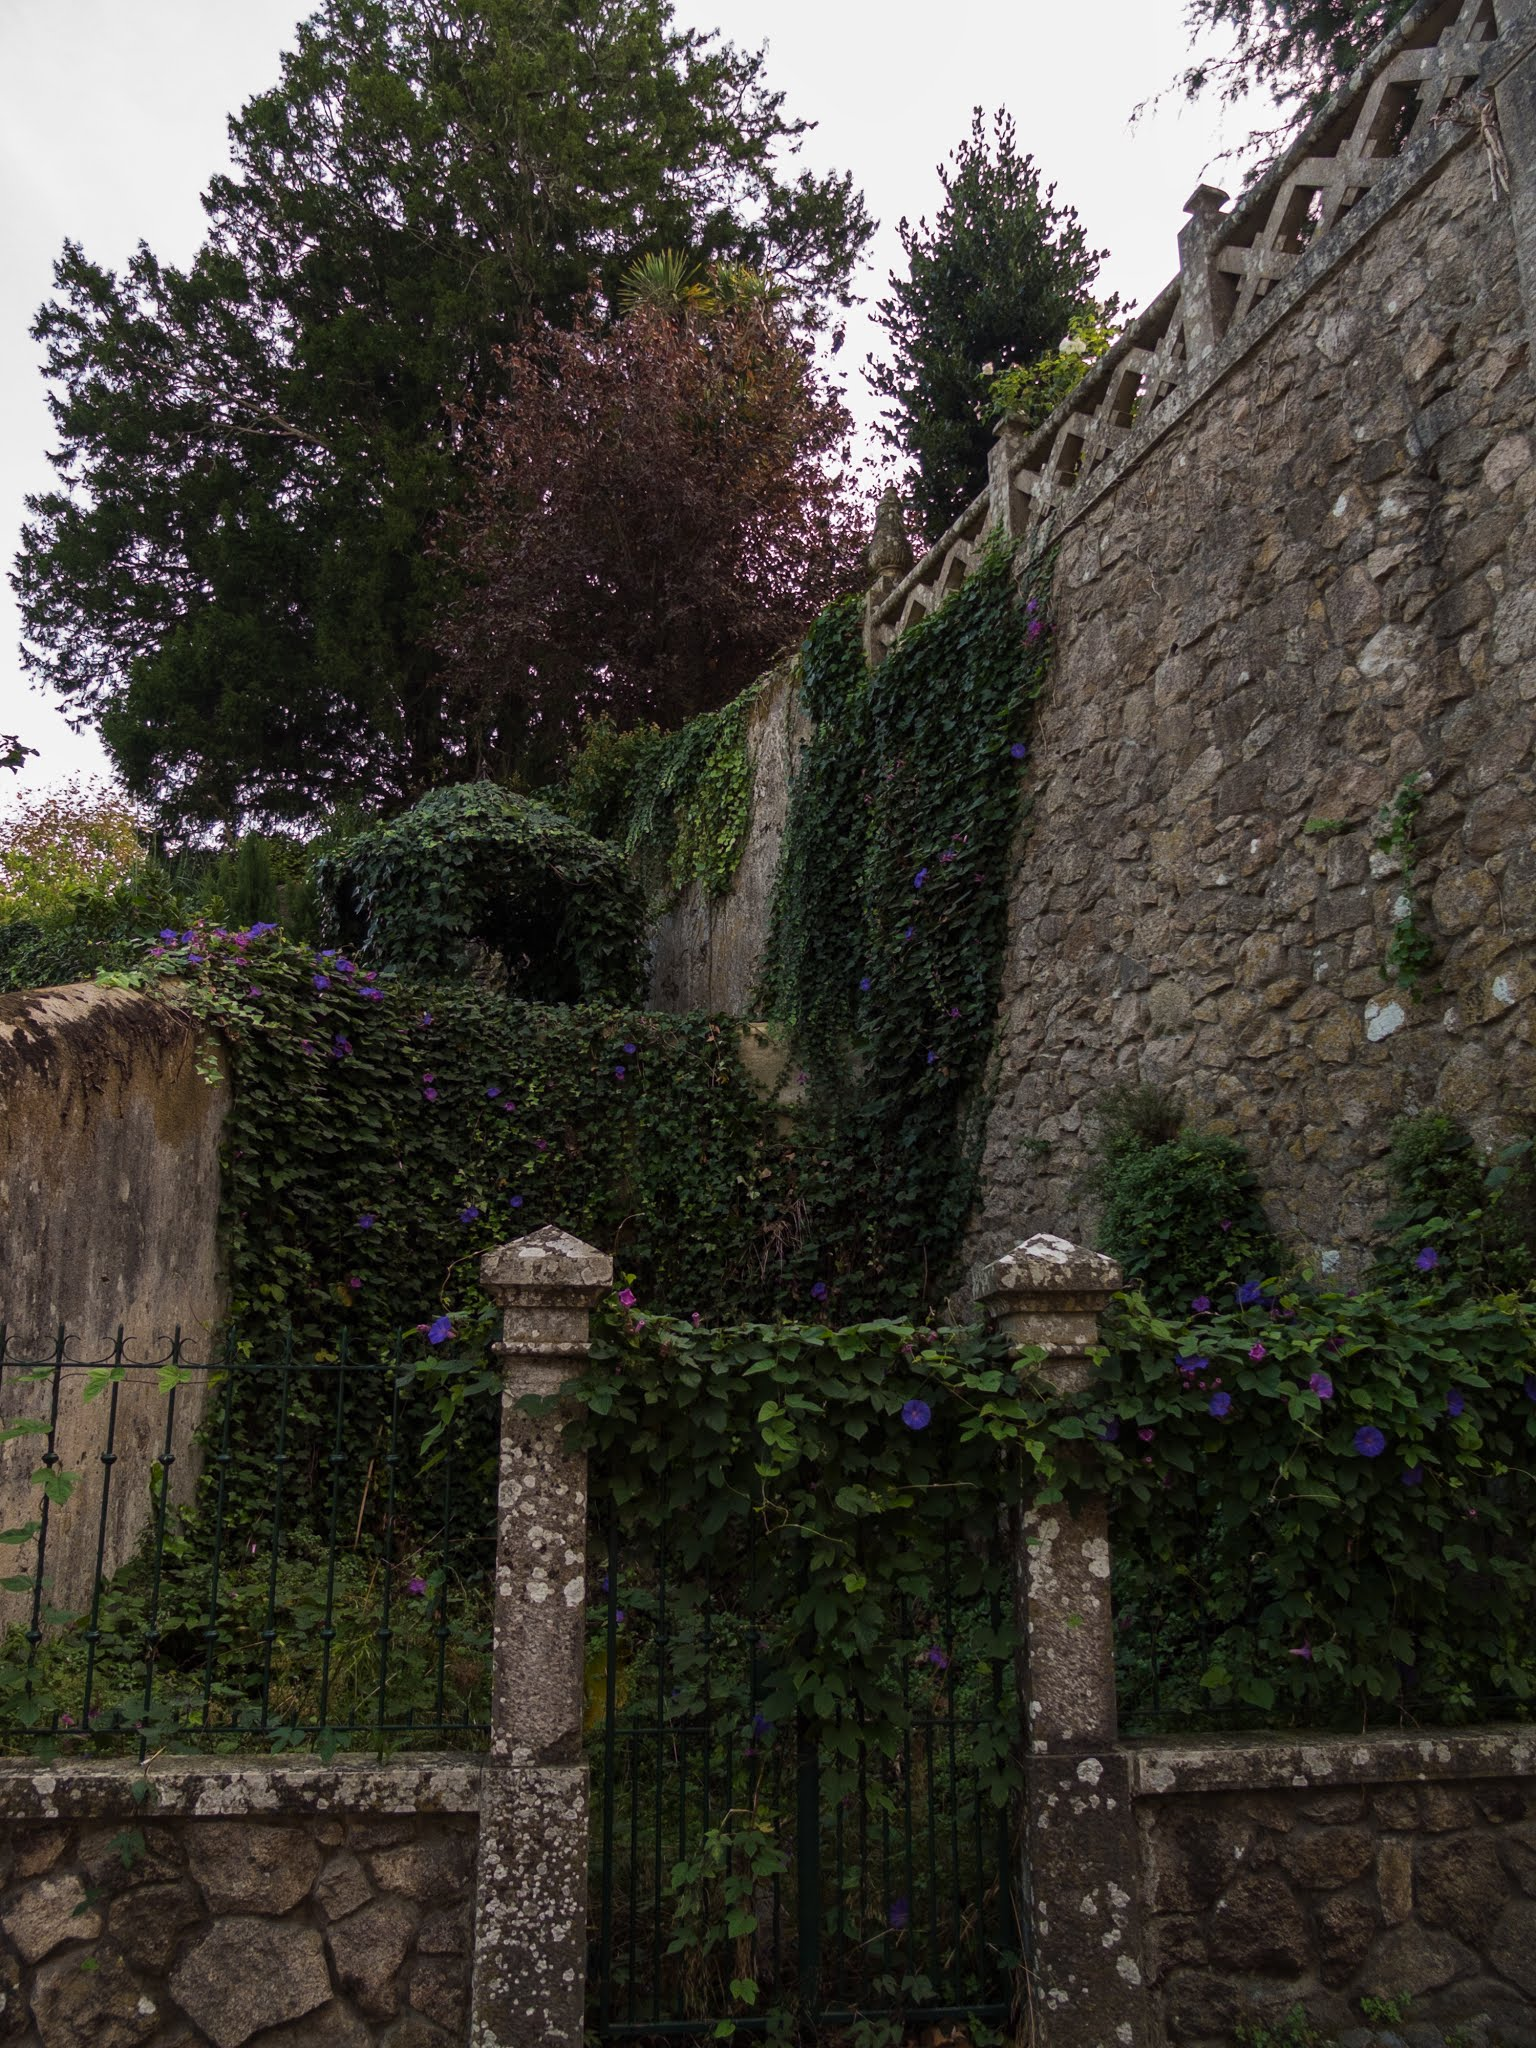 Flowering ivy on walls in Sintra